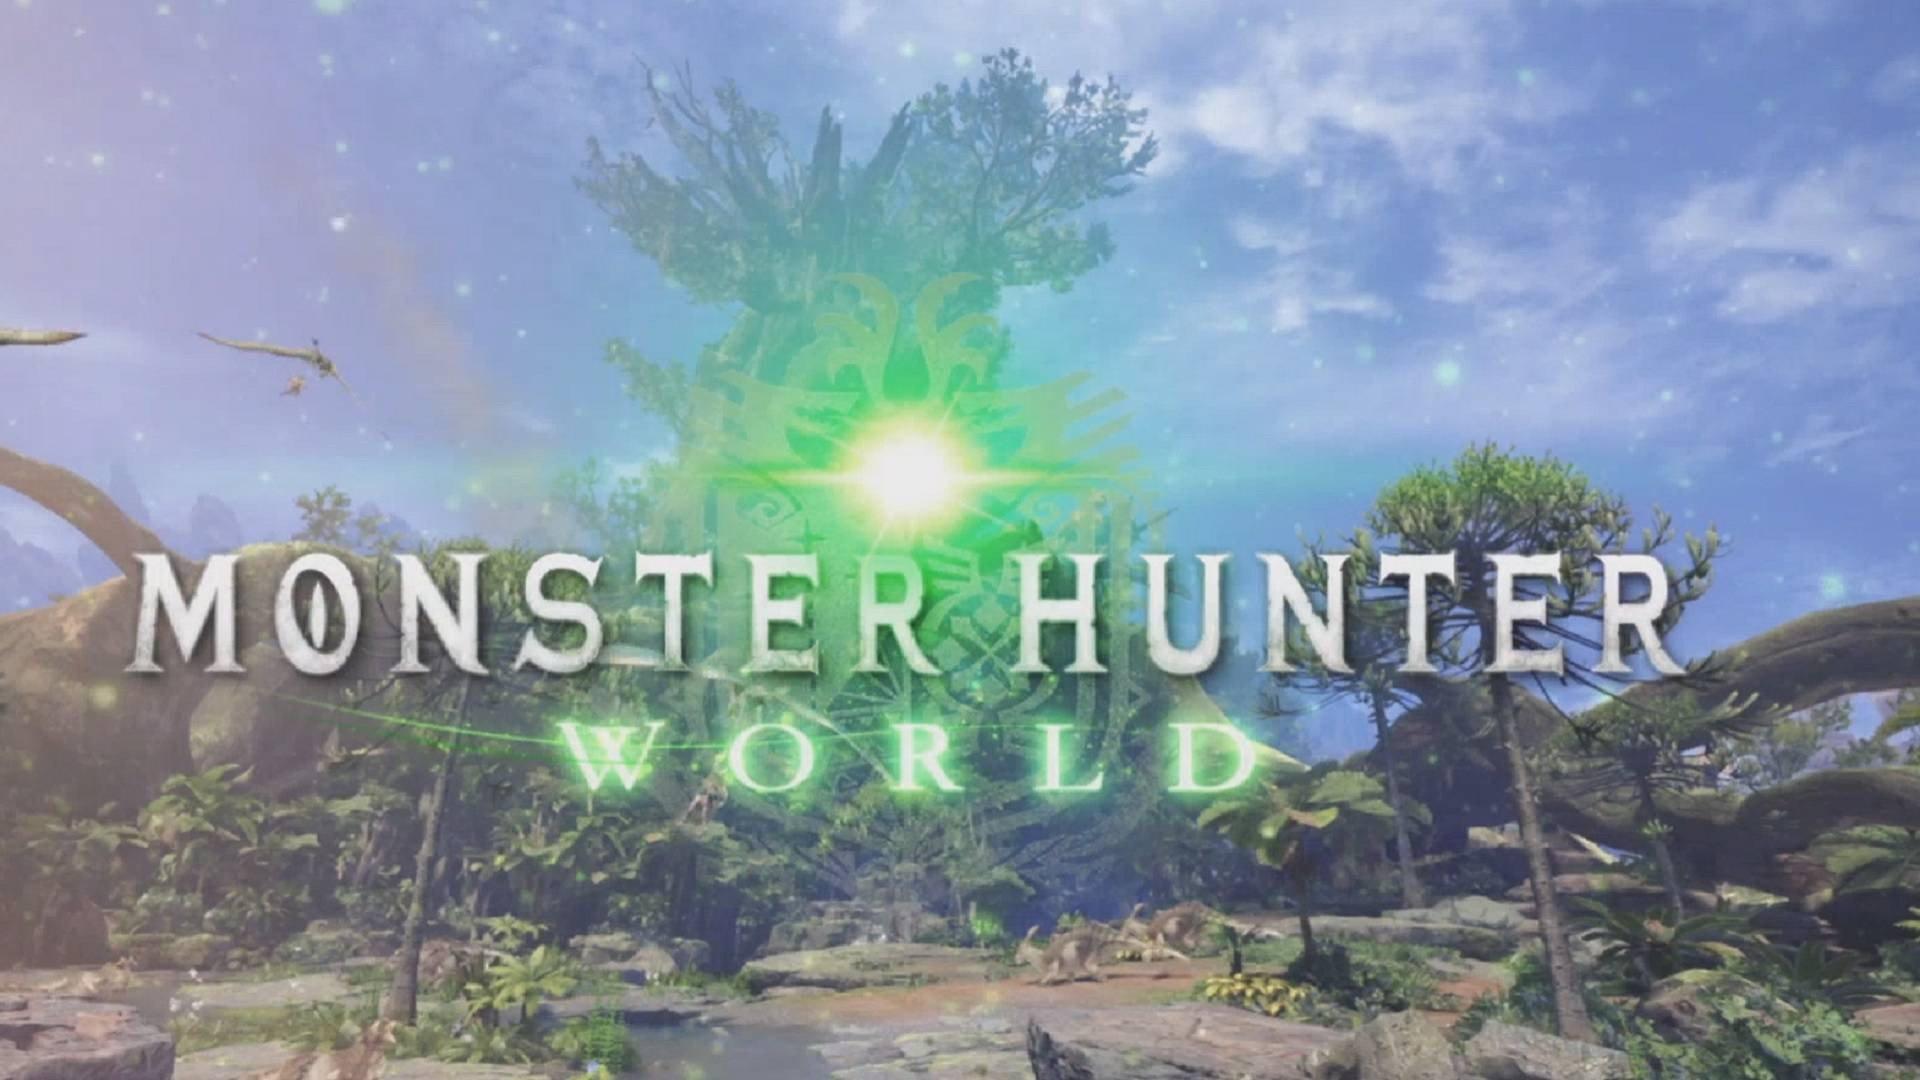 ea47522669 Το Monster Hunter World είναι ο τίτλος της Capcom με τις ...